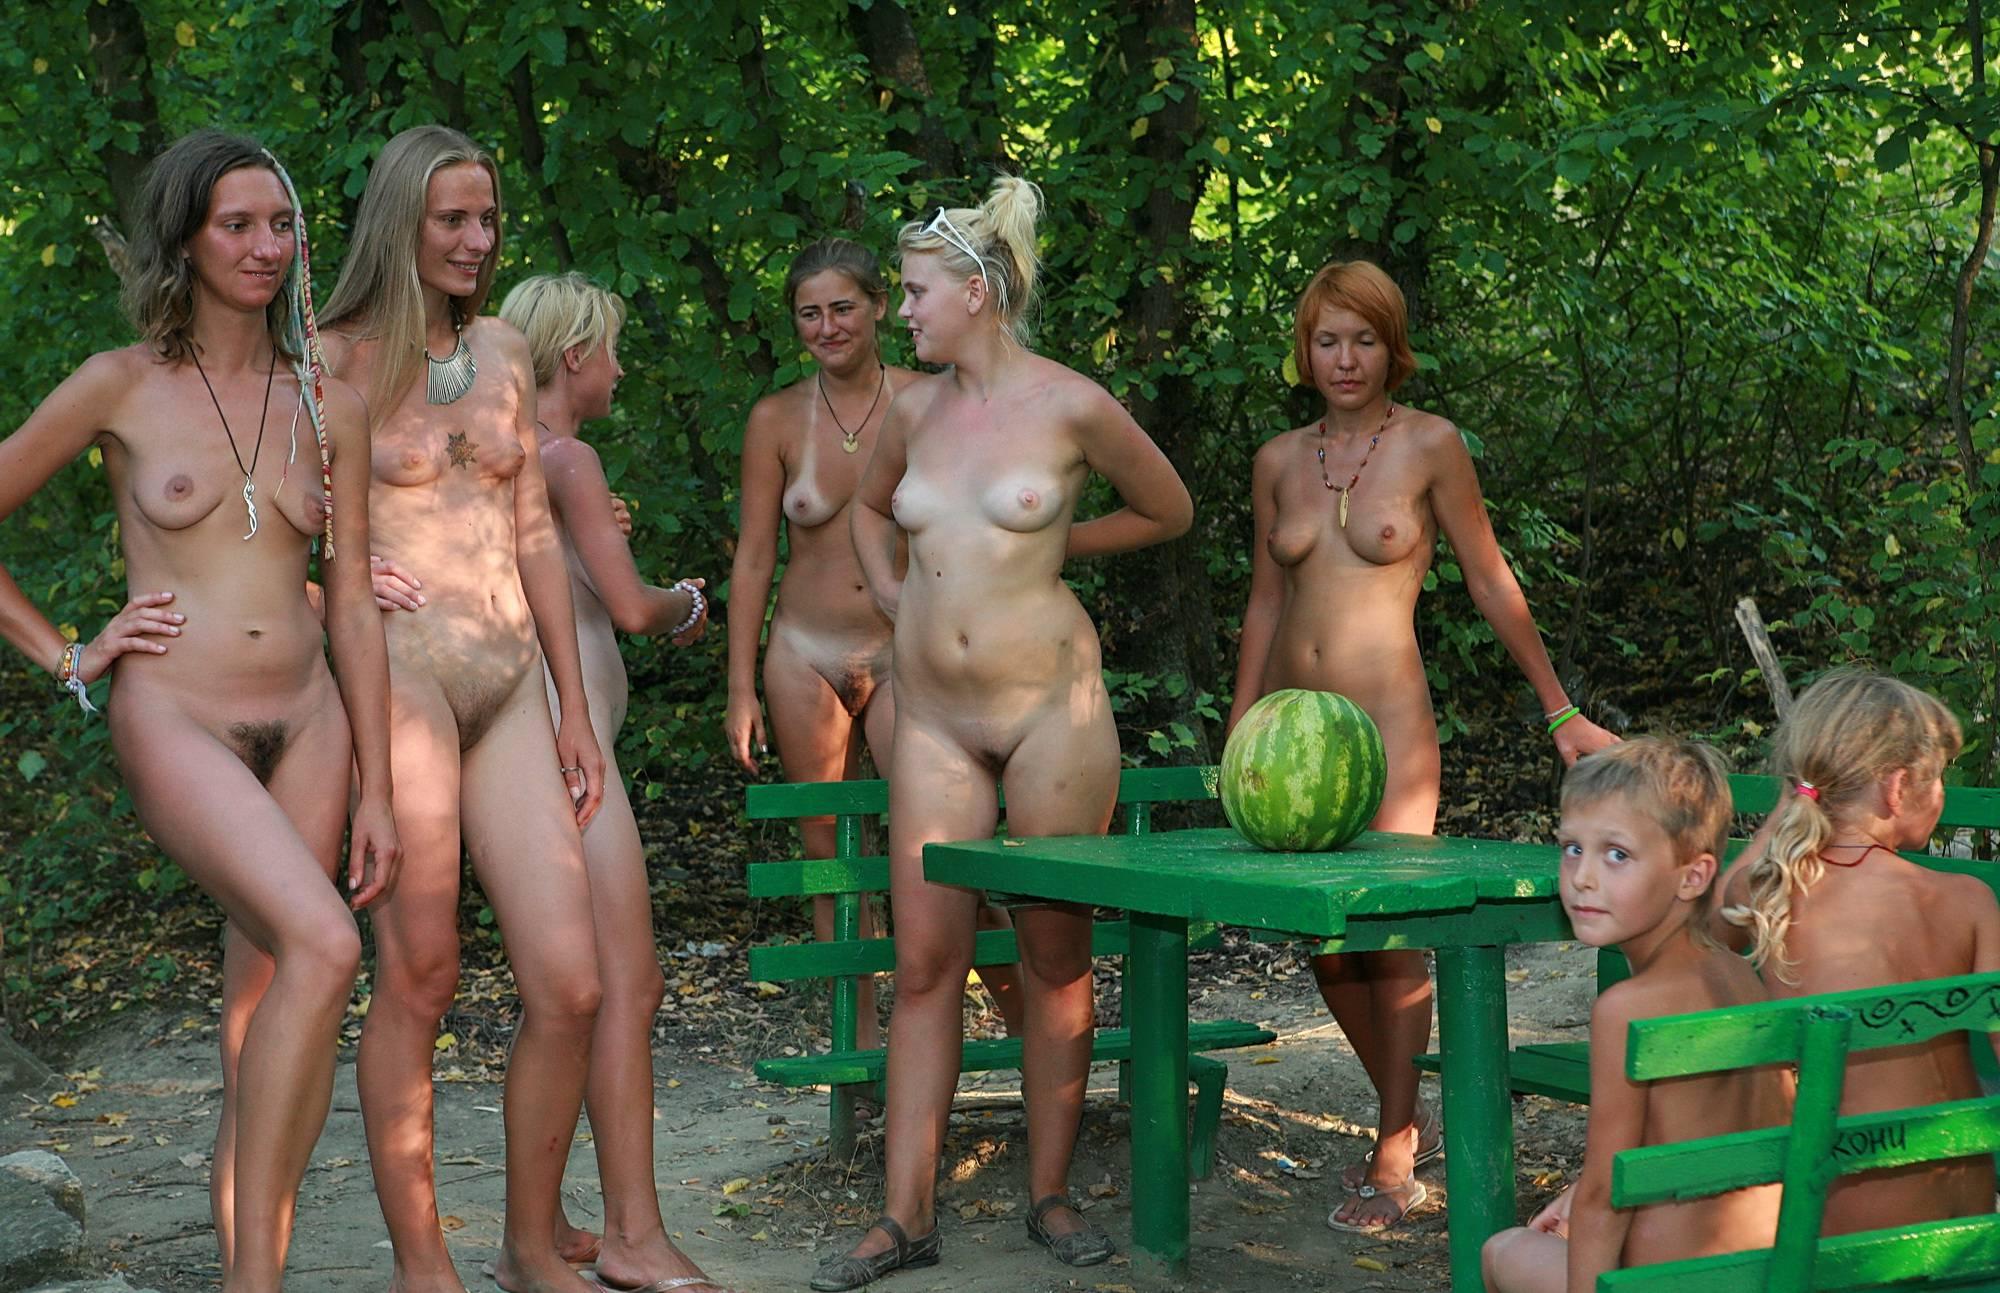 Green Picnic Naturists - 2